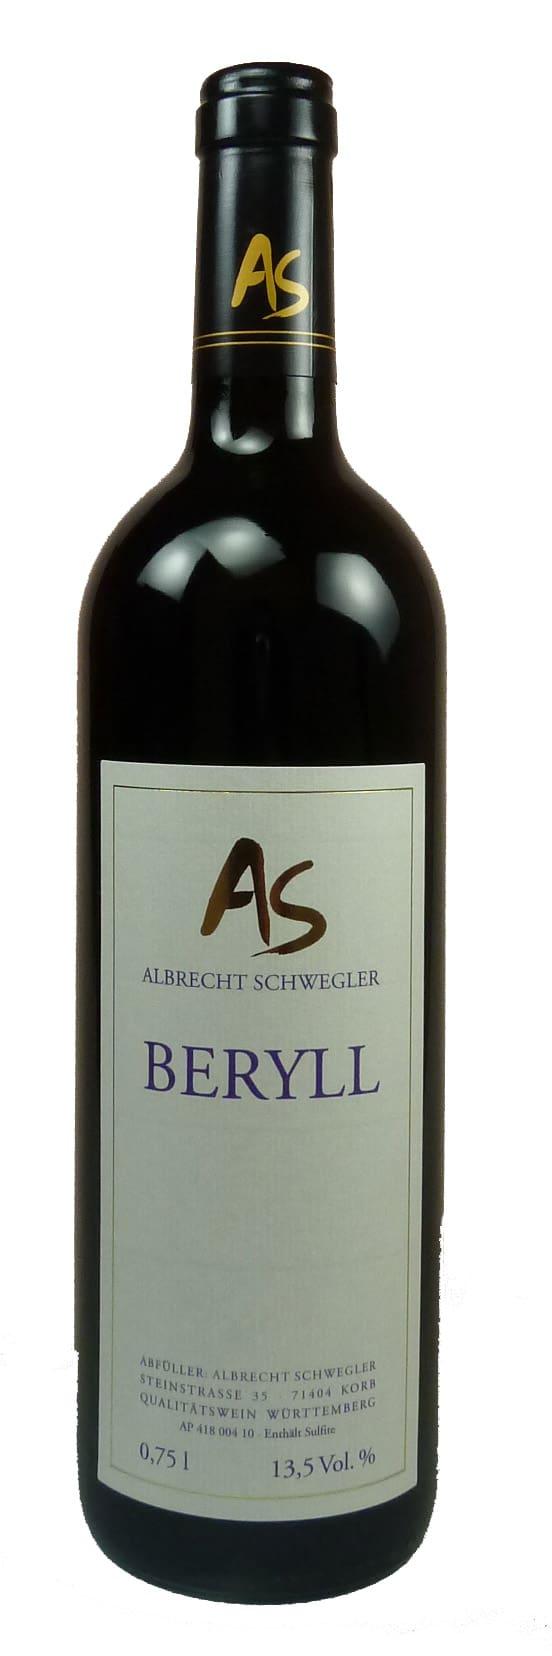 Beryll Qualitätswein trocken 2014